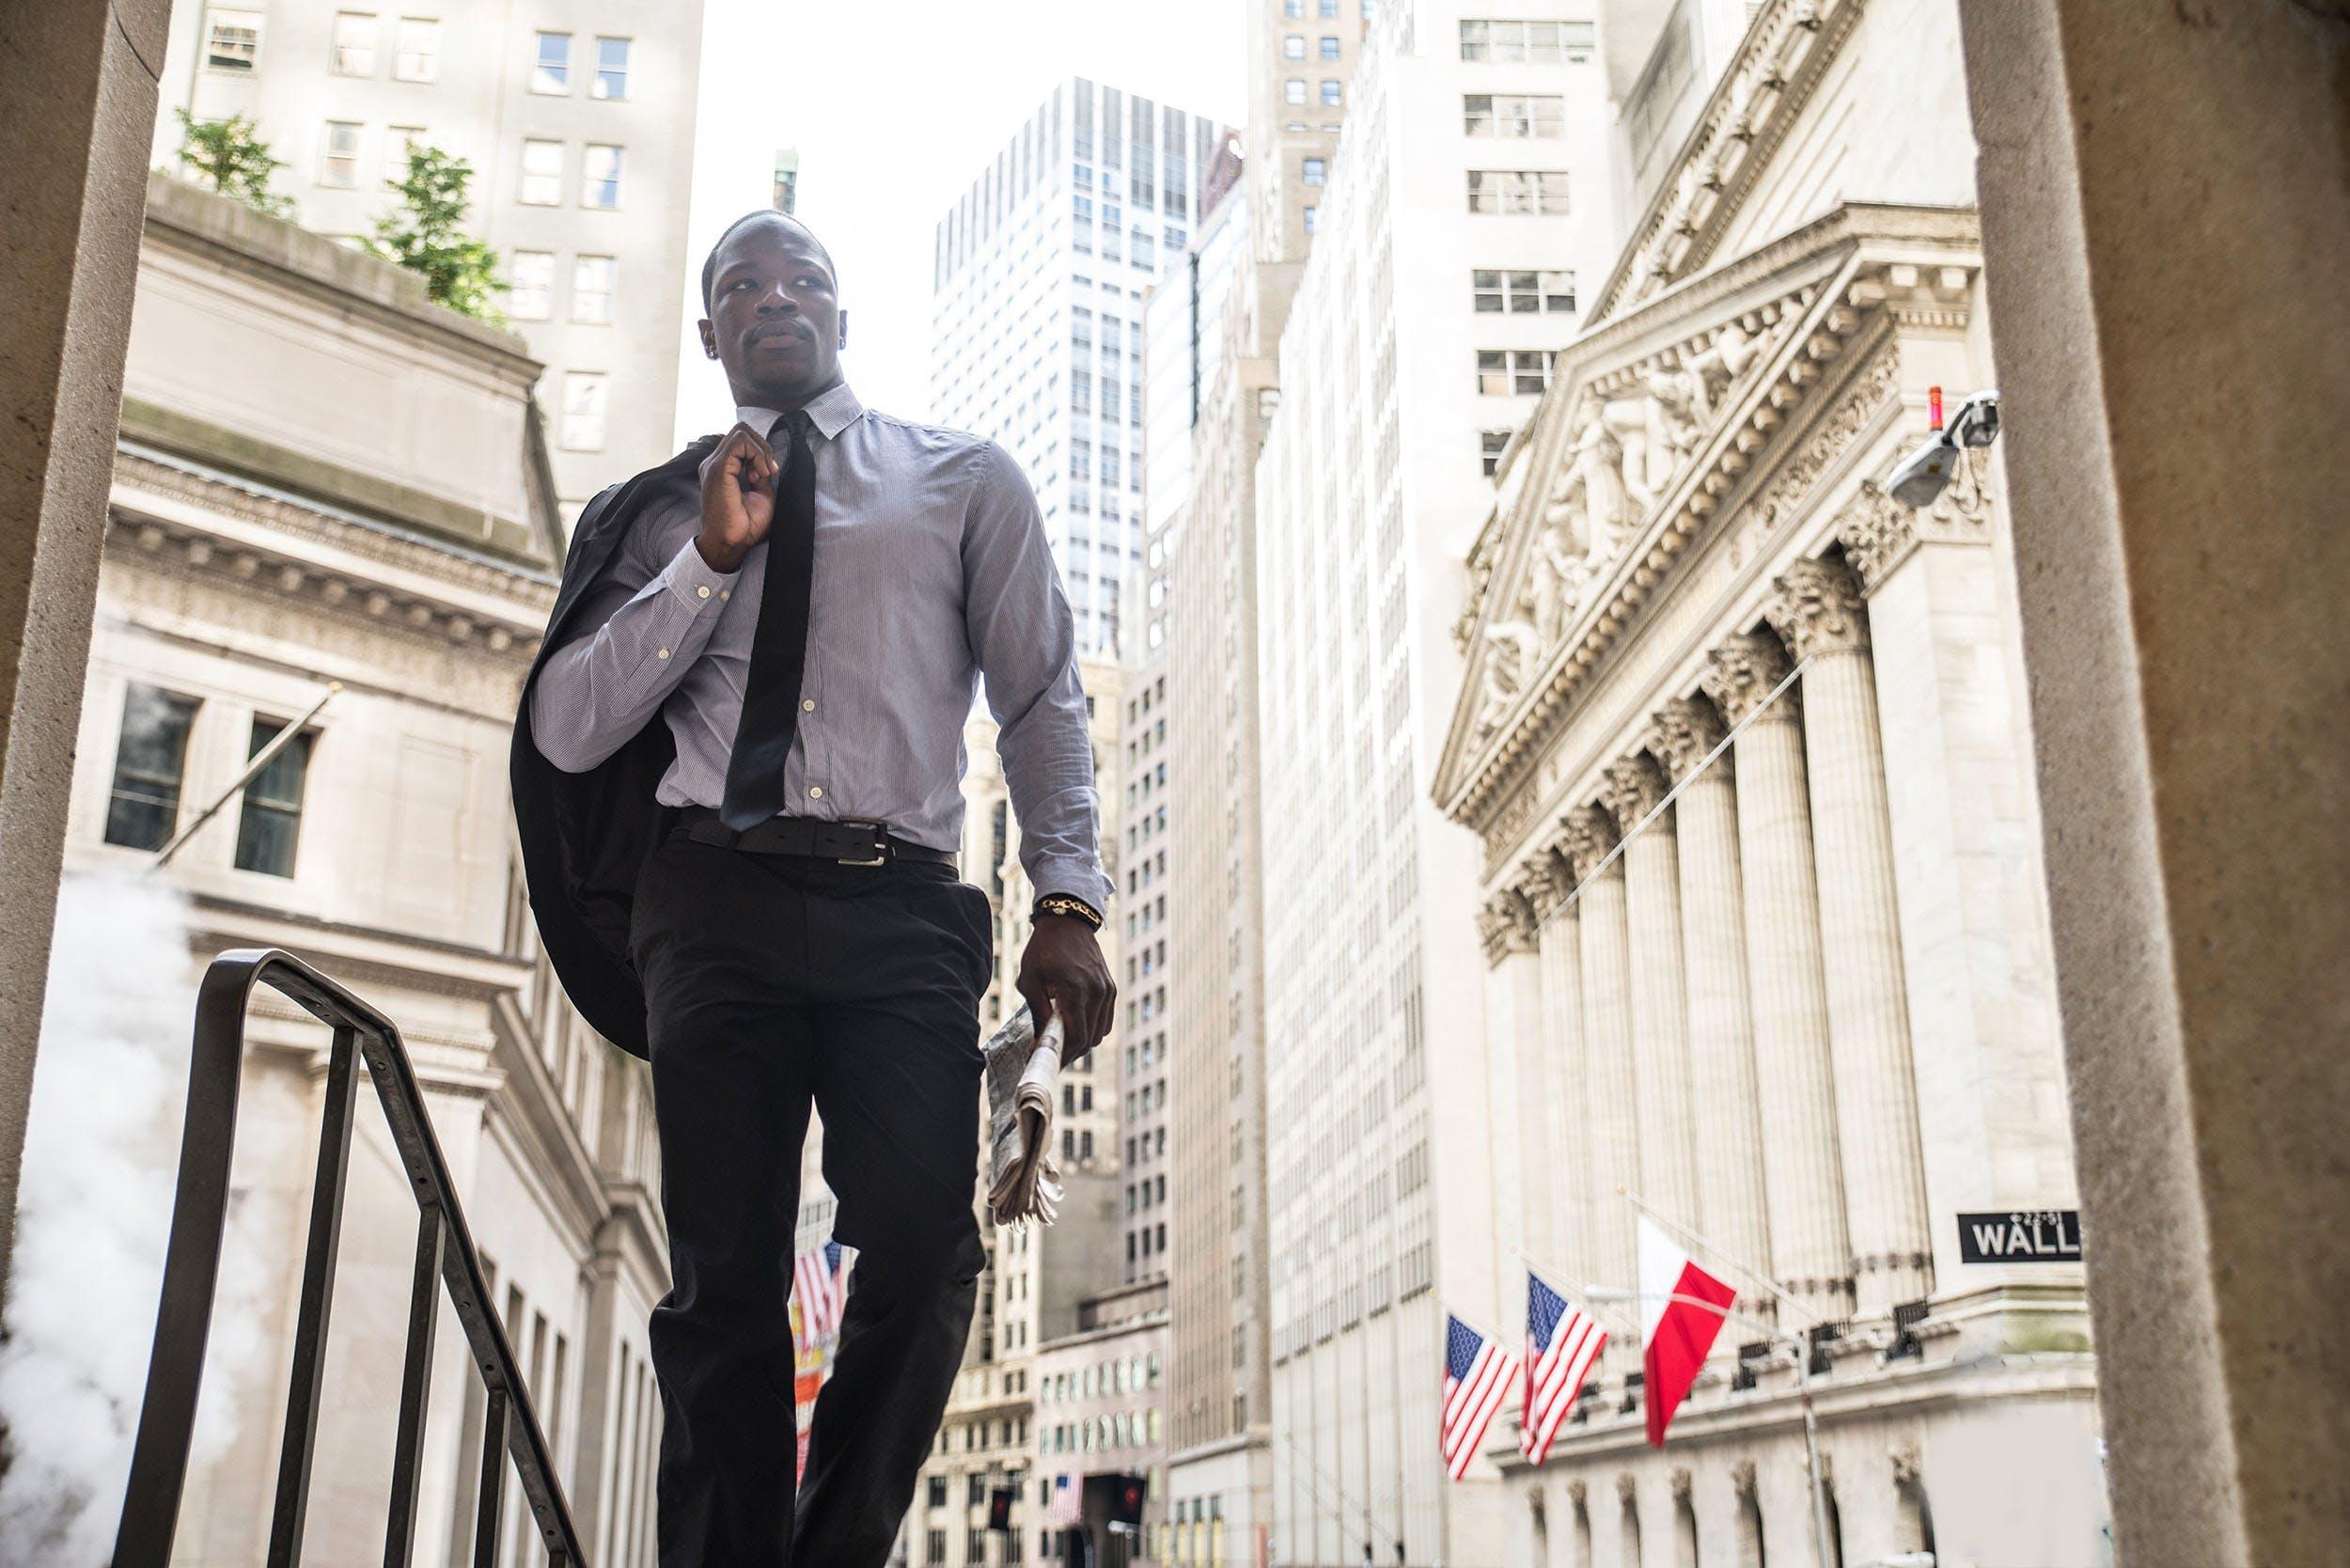 61be86e903b Businessman on Wall Street - Lower Manhattan - New York City